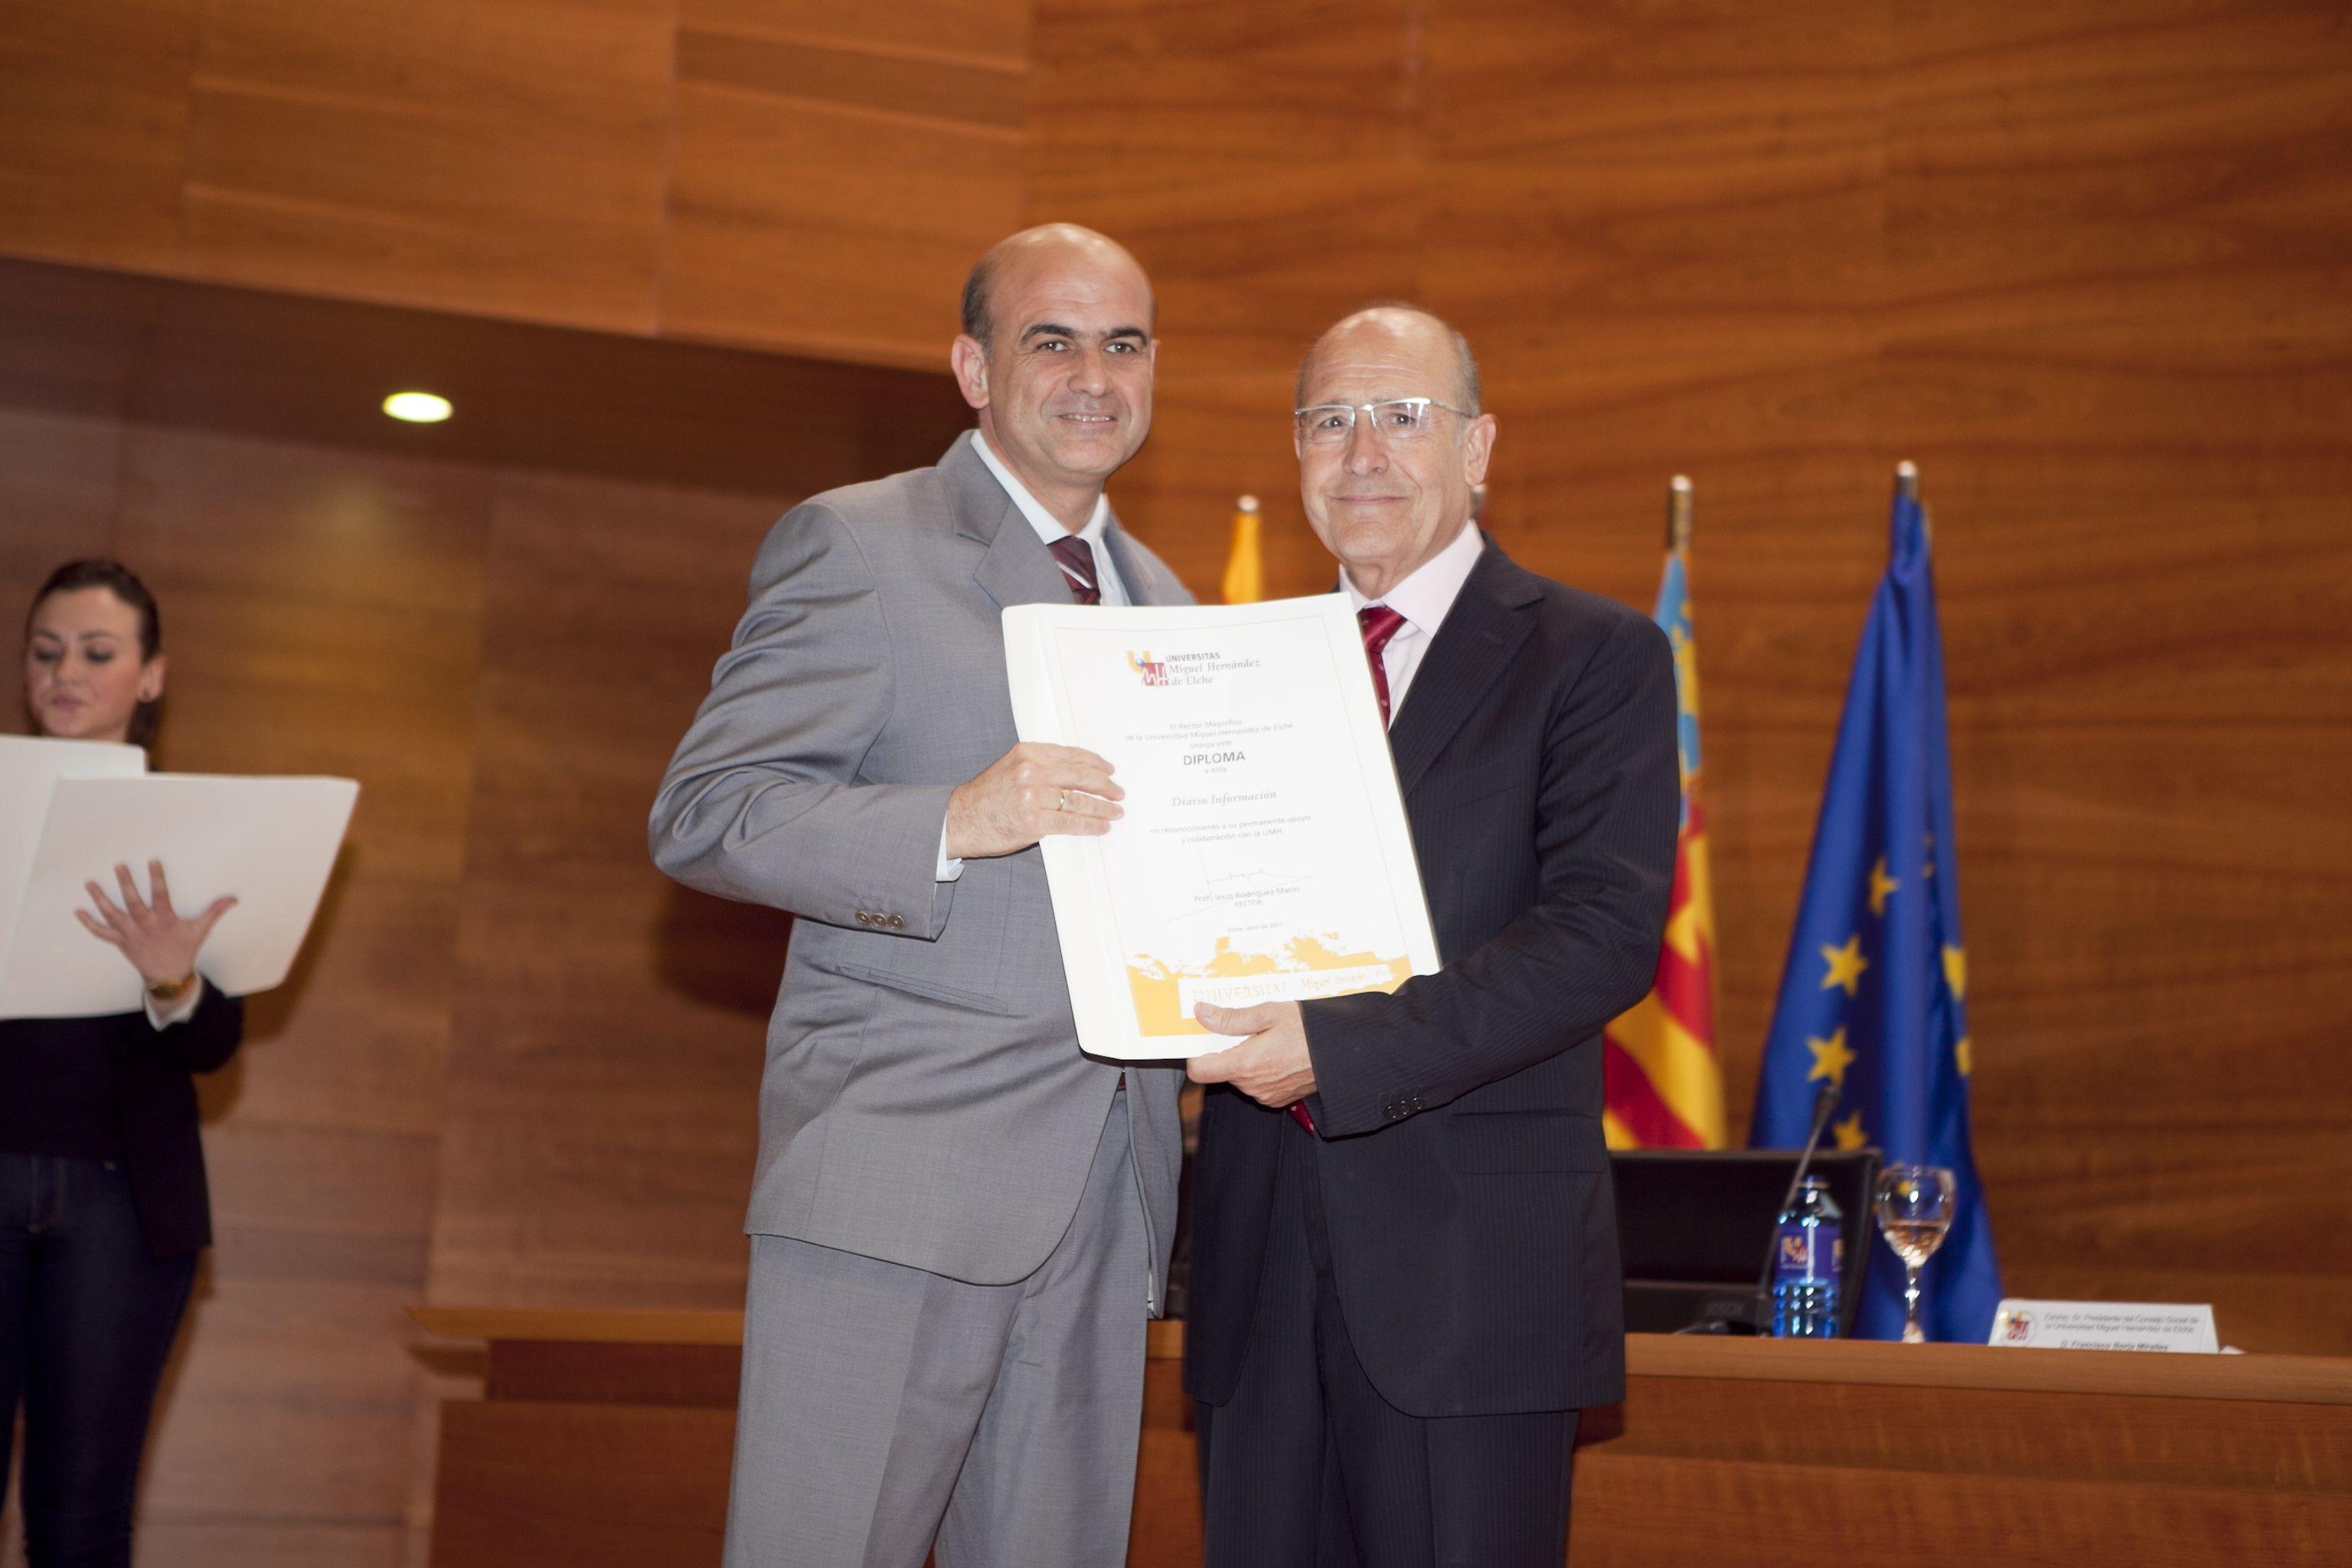 umh-diplomas-rector_mg_6861.jpg